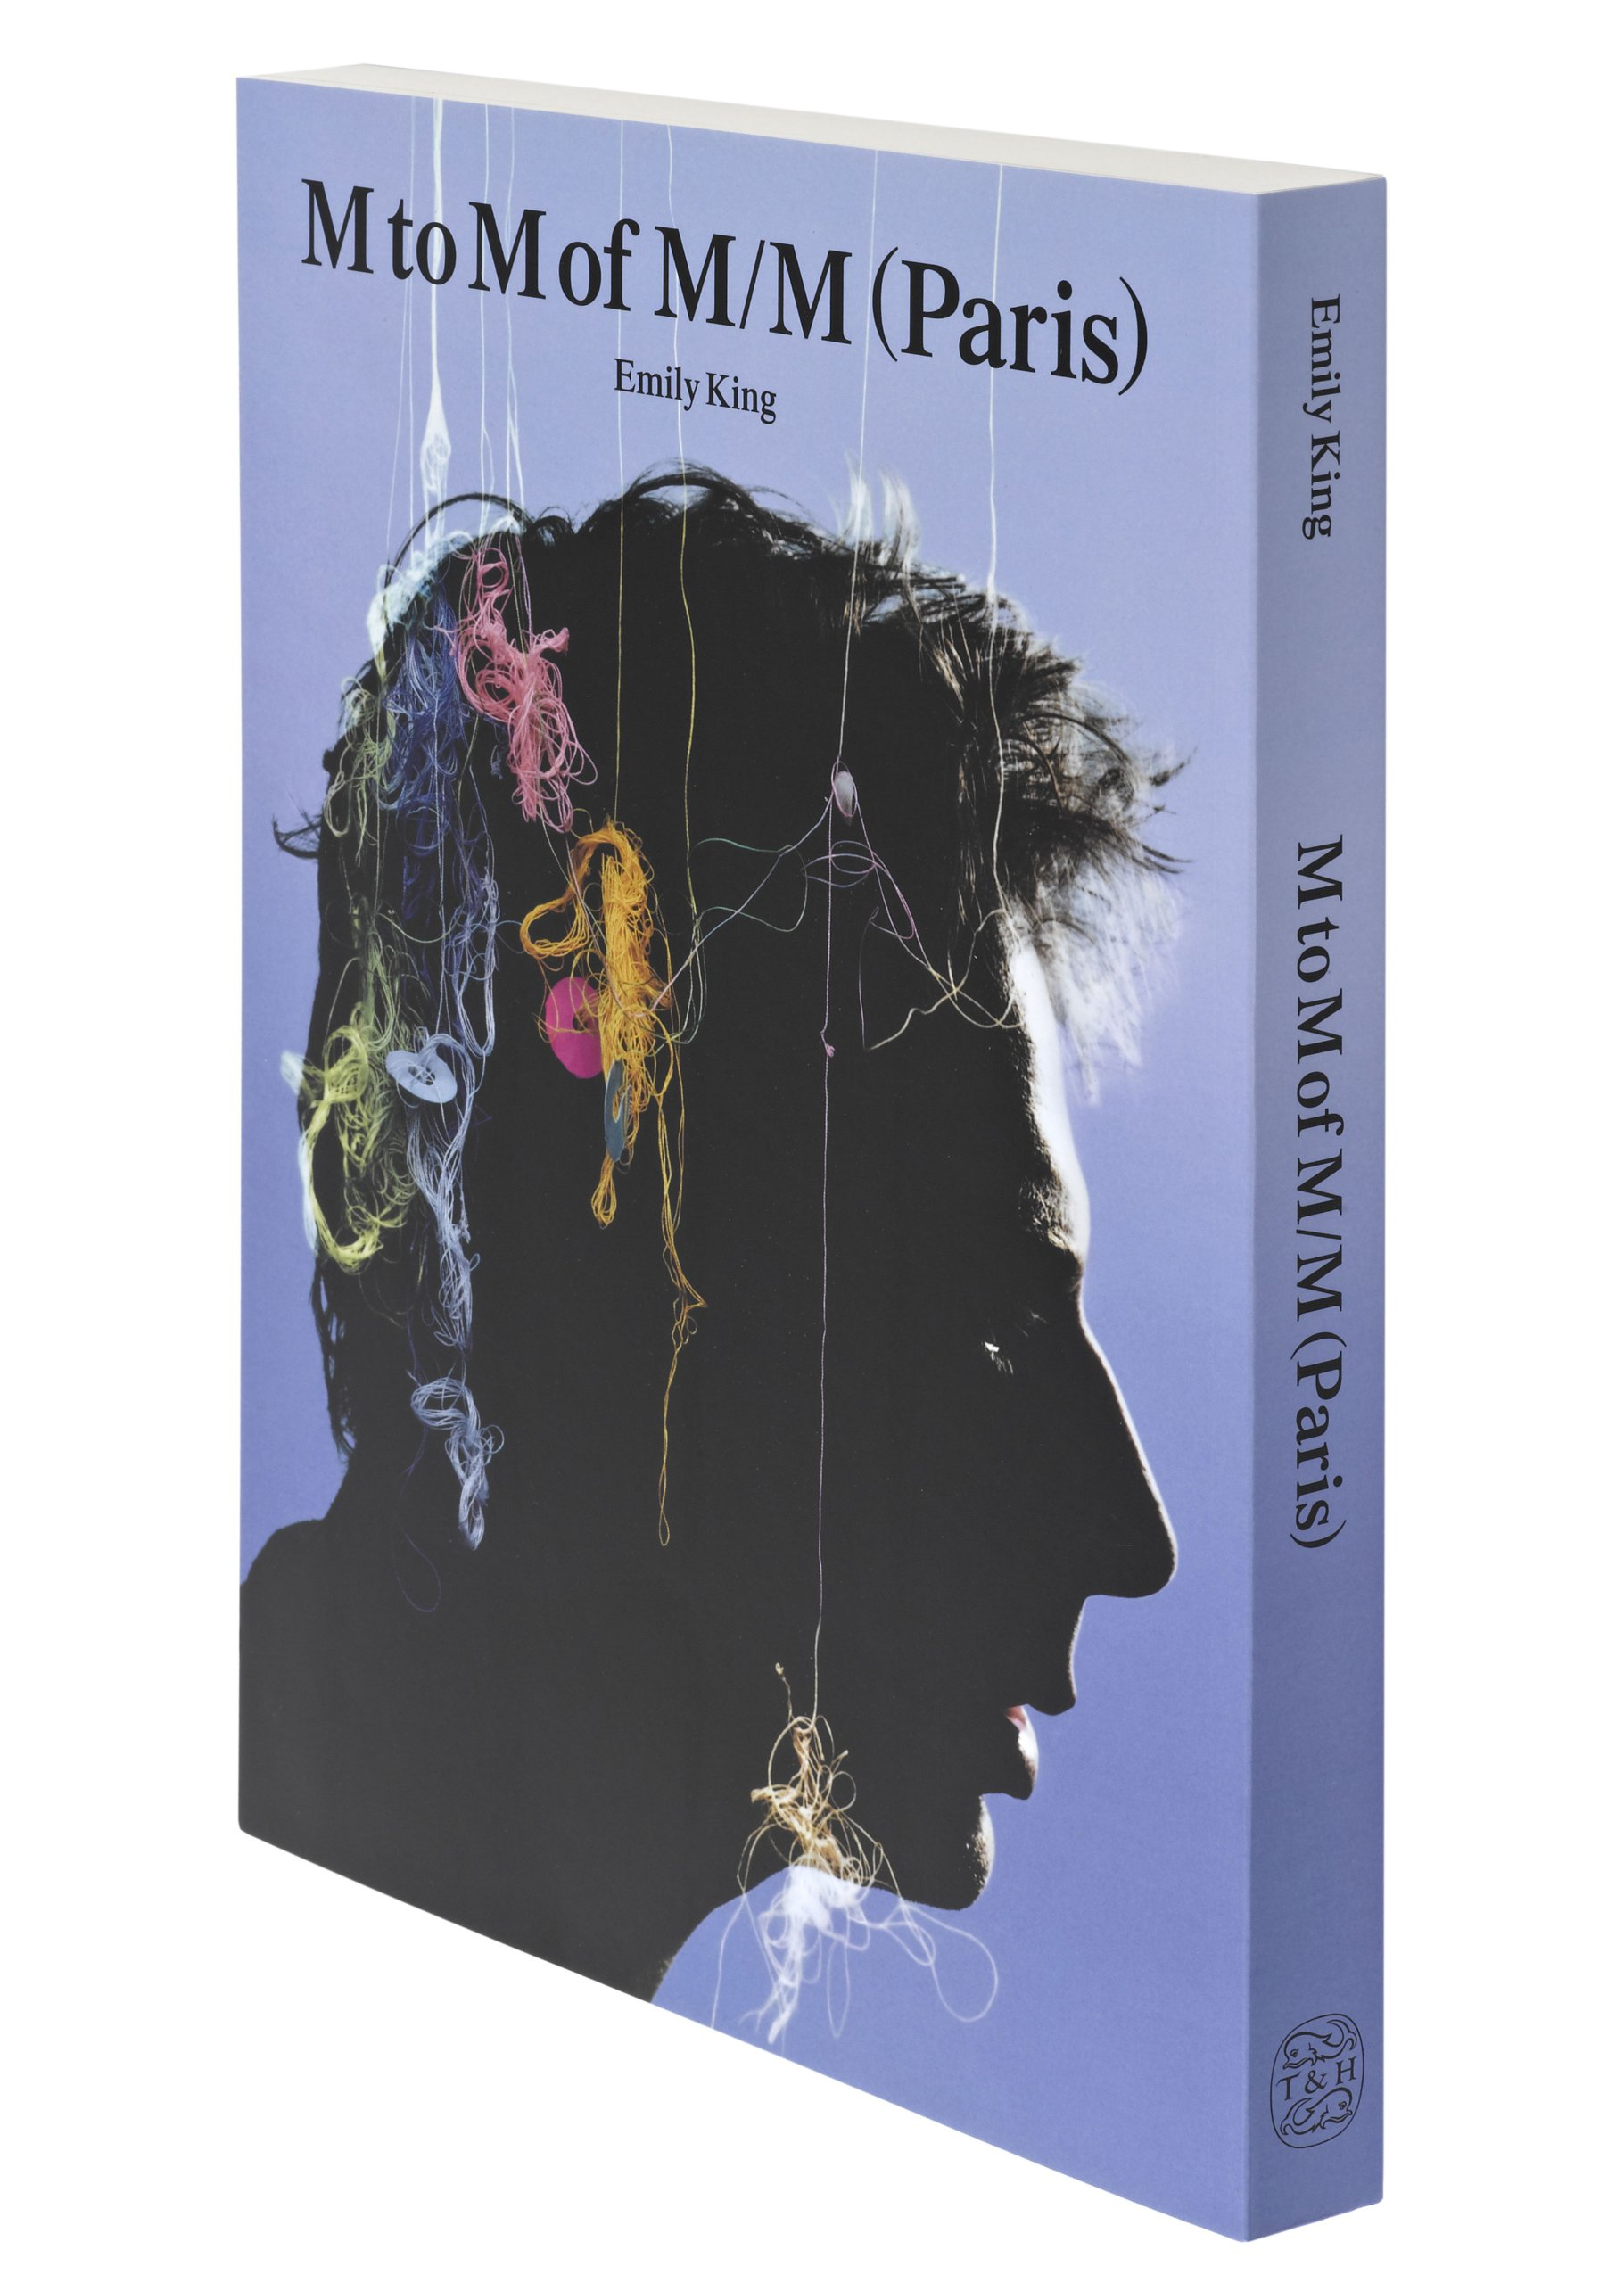 M to M of M/M (Paris): Amazon.es: Emily King, Hans Ulrich Obrist: Libros en idiomas extranjeros